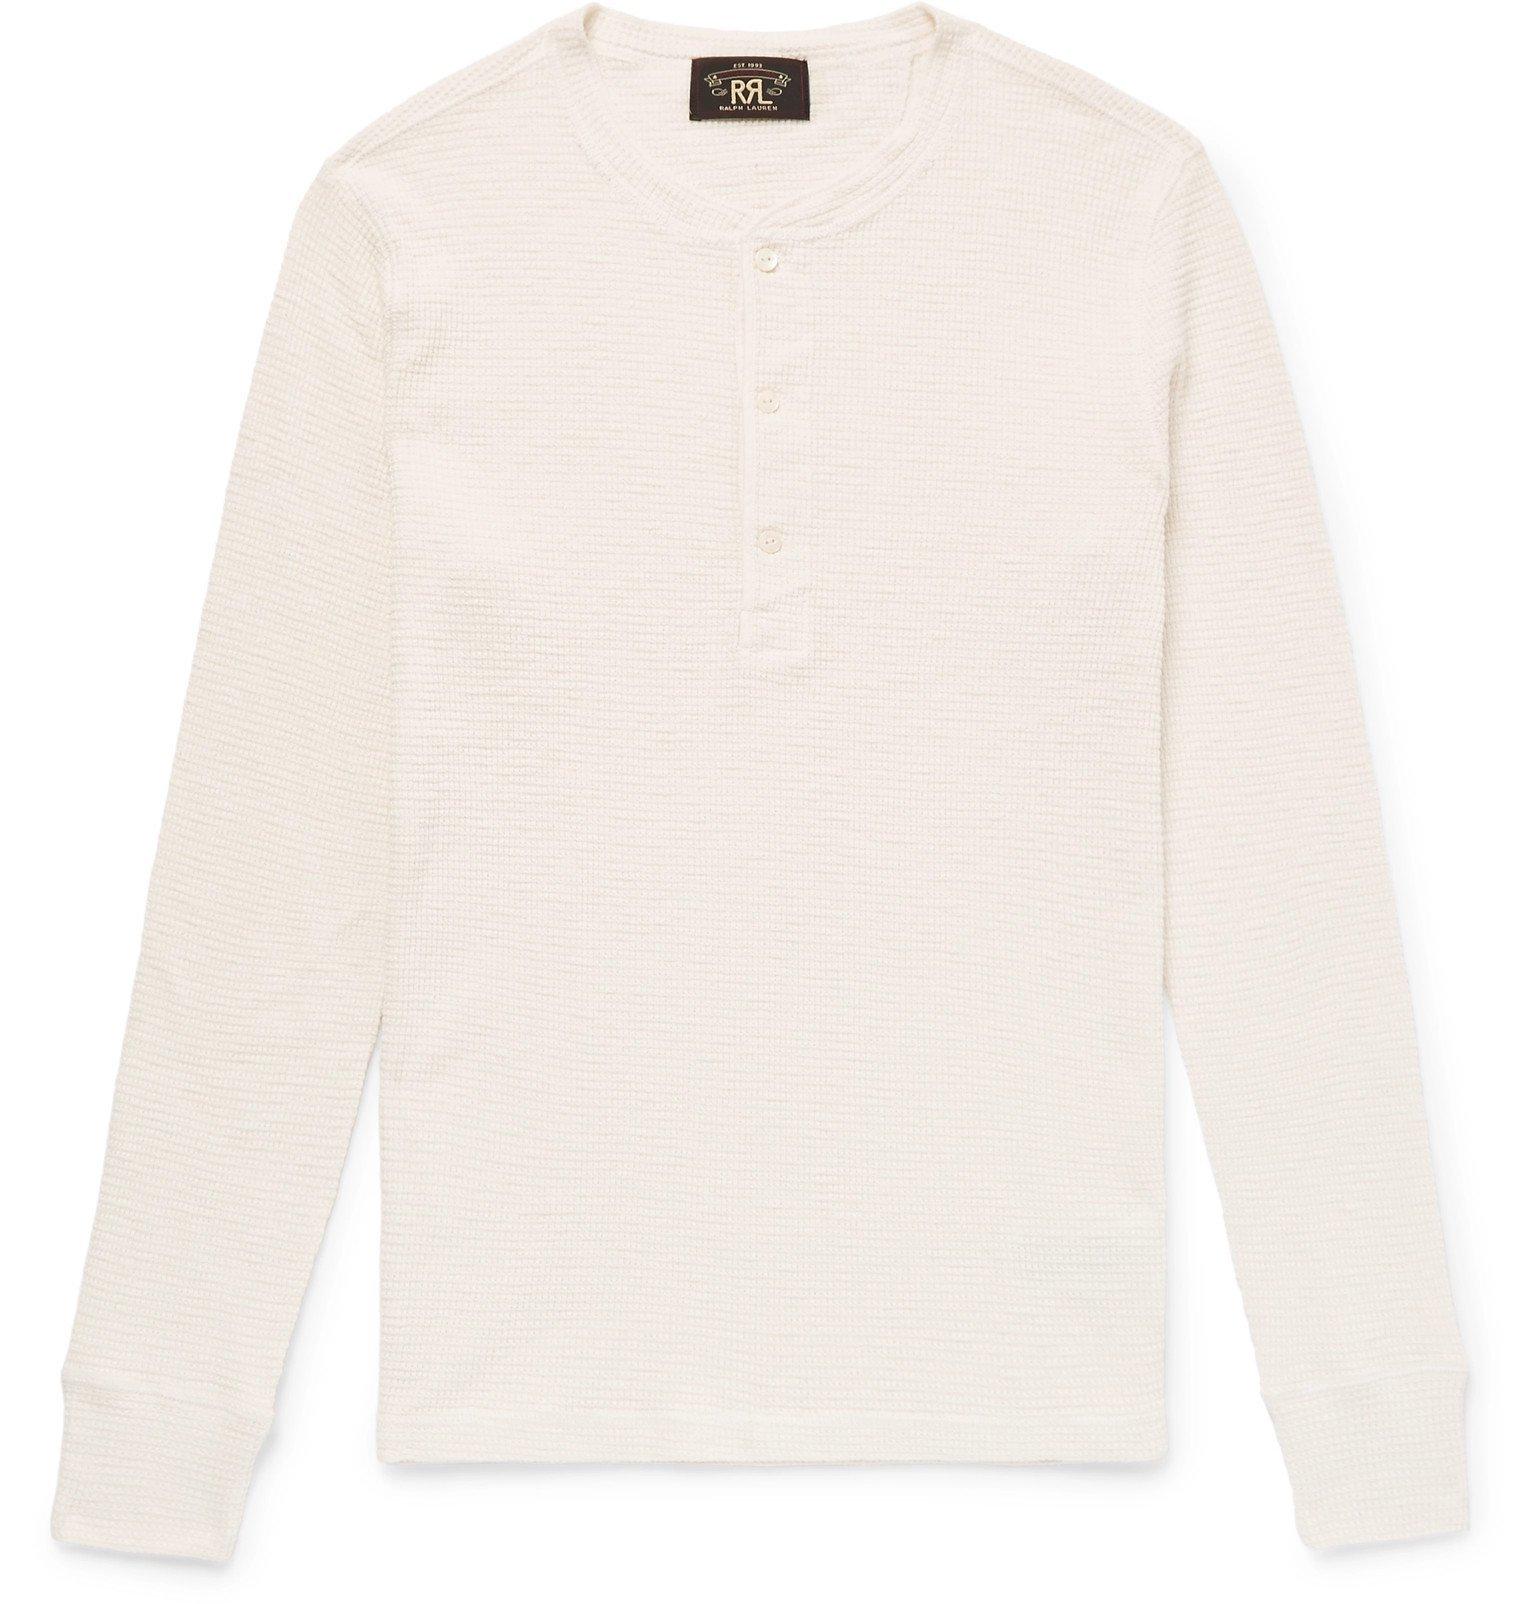 RRL - Waffle-Knit Cotton Henley T-Shirt - White